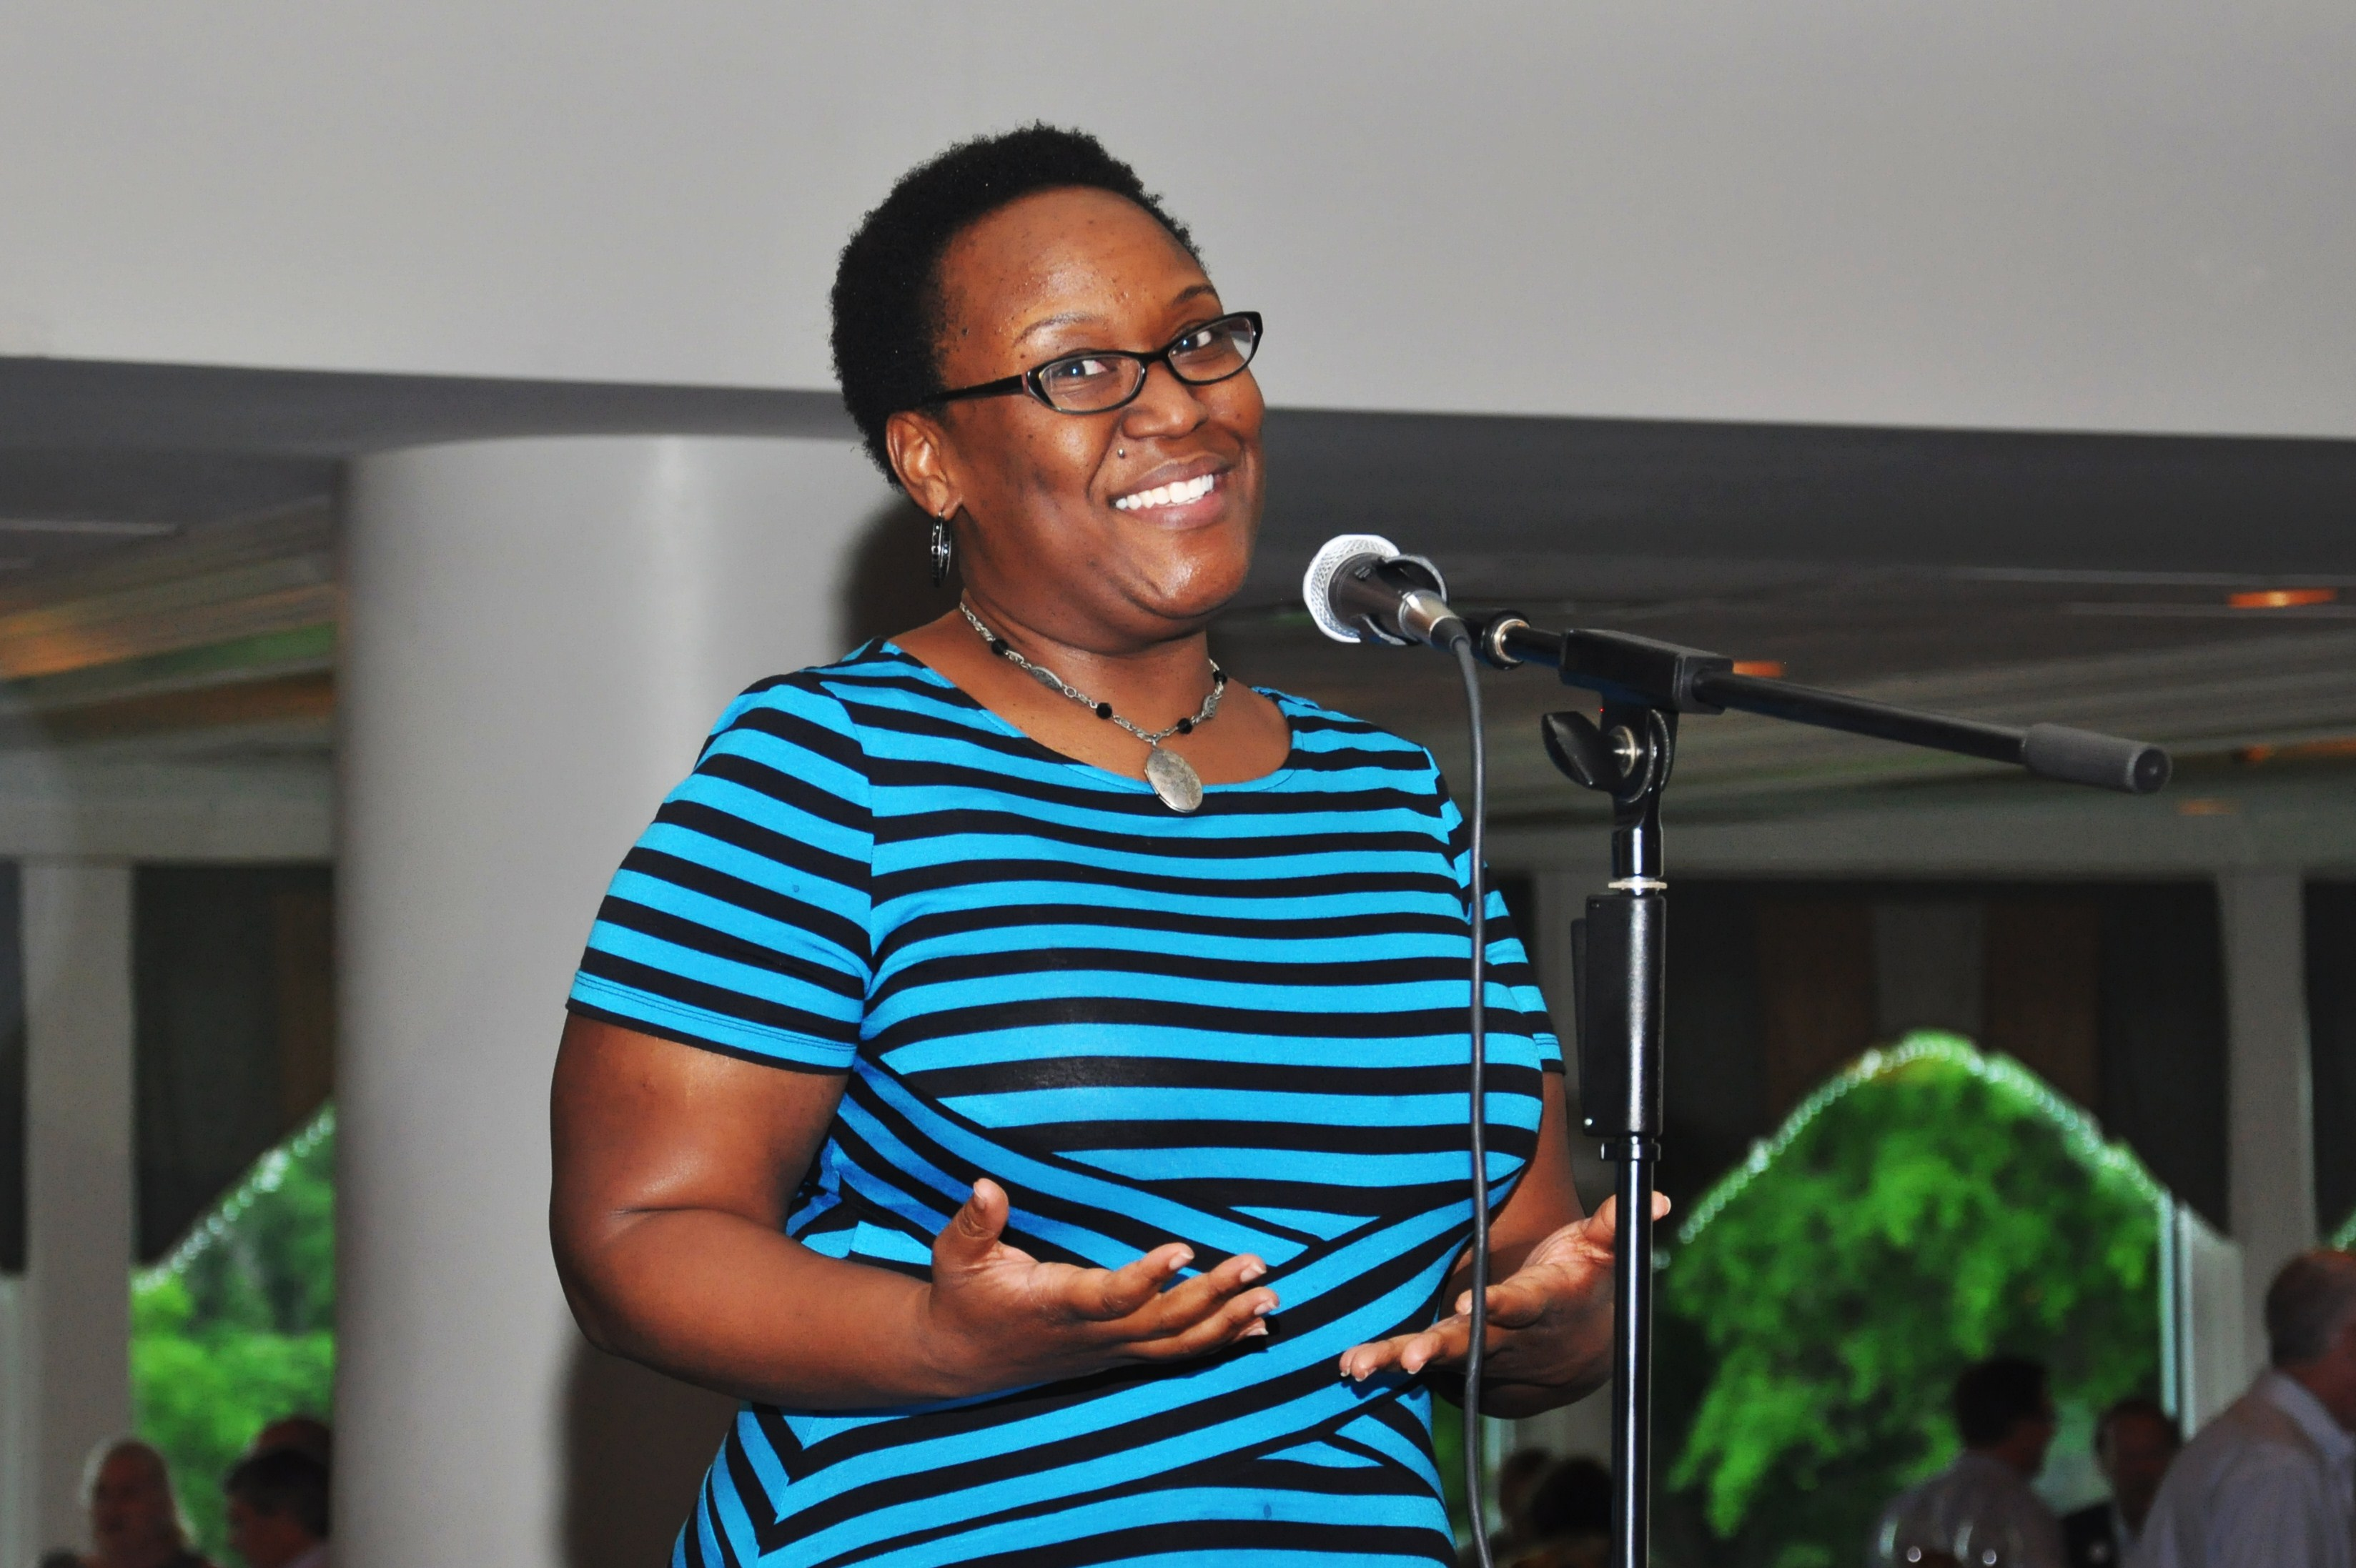 NWC Poet Performance